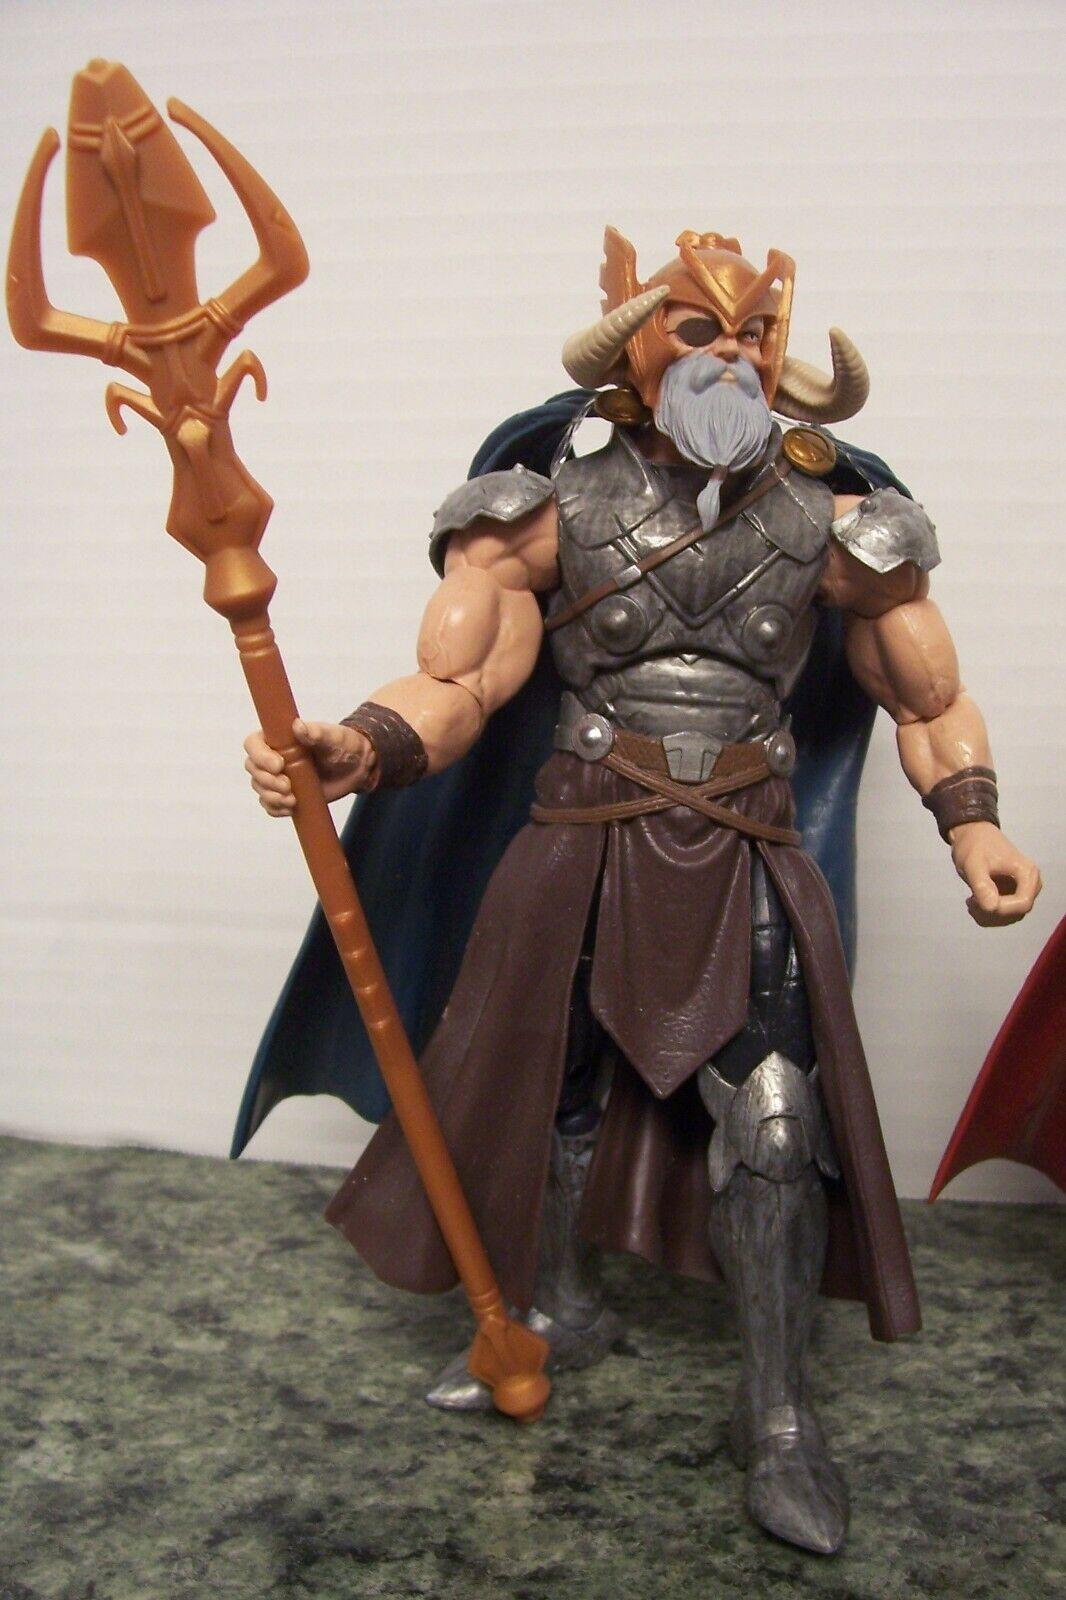 venderse como panqueques Hasbro Marvel Legends 8  Odin Odin Odin Norse Allfather Aesir, 15-pts Artic. Completa Casi Nuevo  distribución global